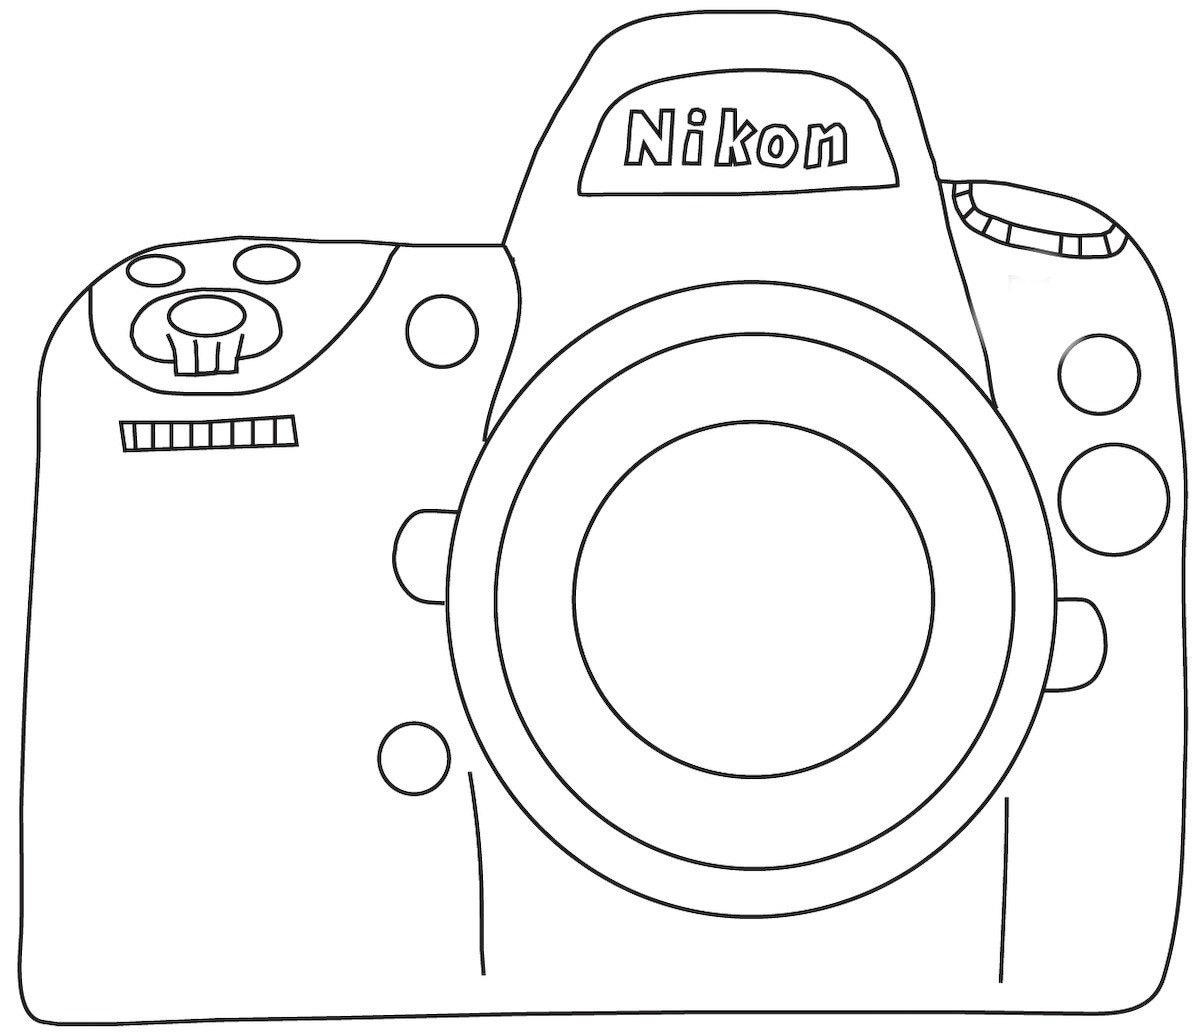 how to draw a nikon camera